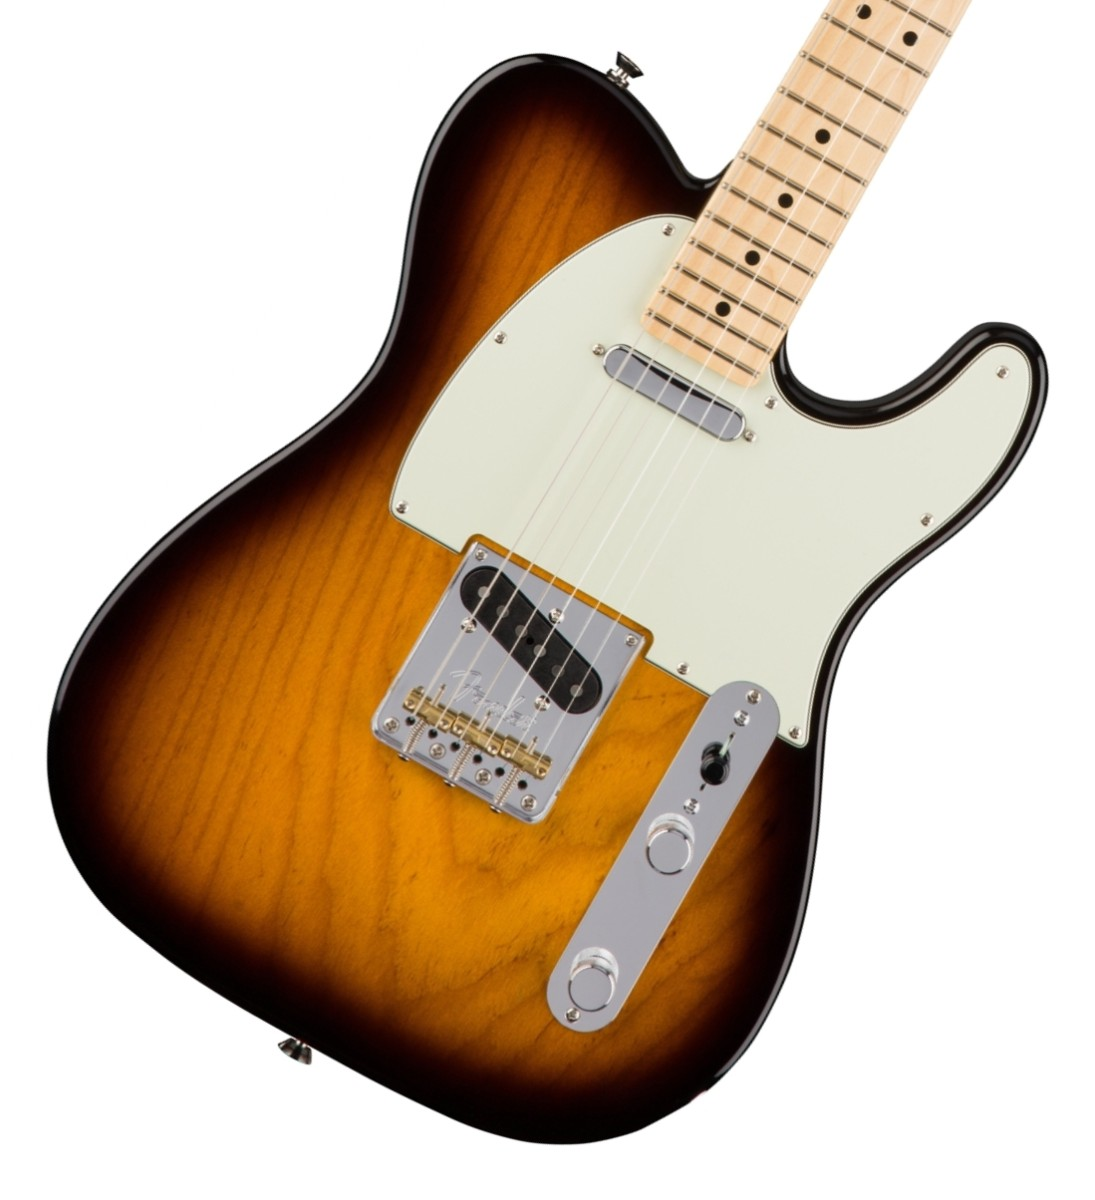 Fender USA / American Pro Telecaster 2-Color Sunburst Maple フェンダー《ランチボックス特典! /+681448600》【YRK】